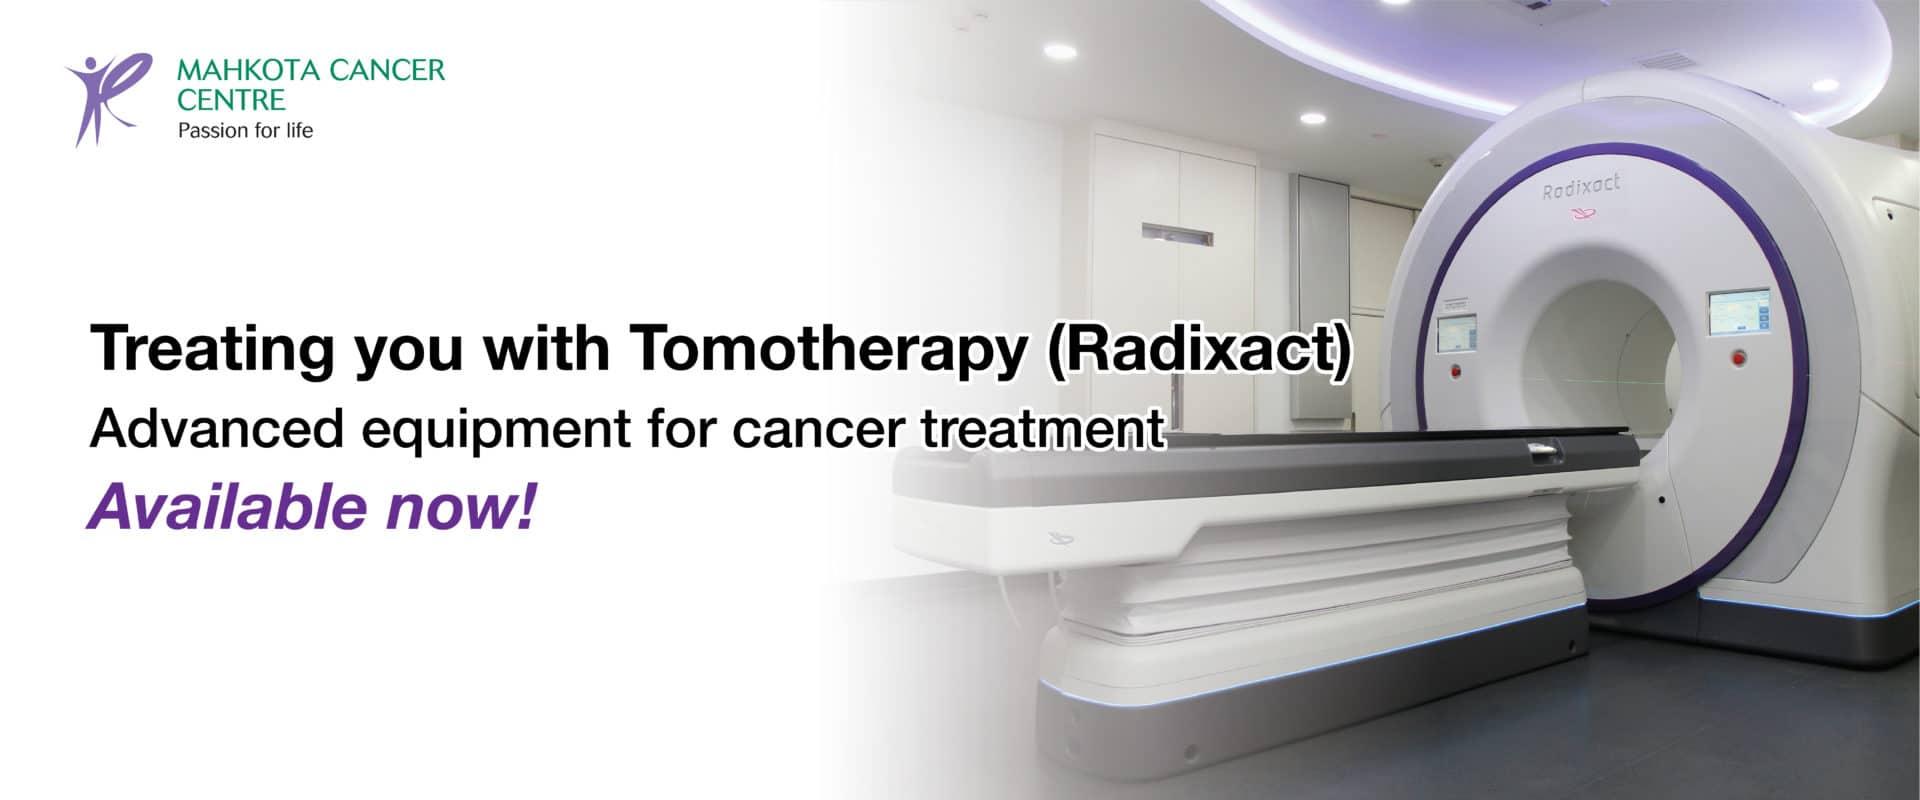 Mahkota Medical Centre - Comprehensive quality medical services